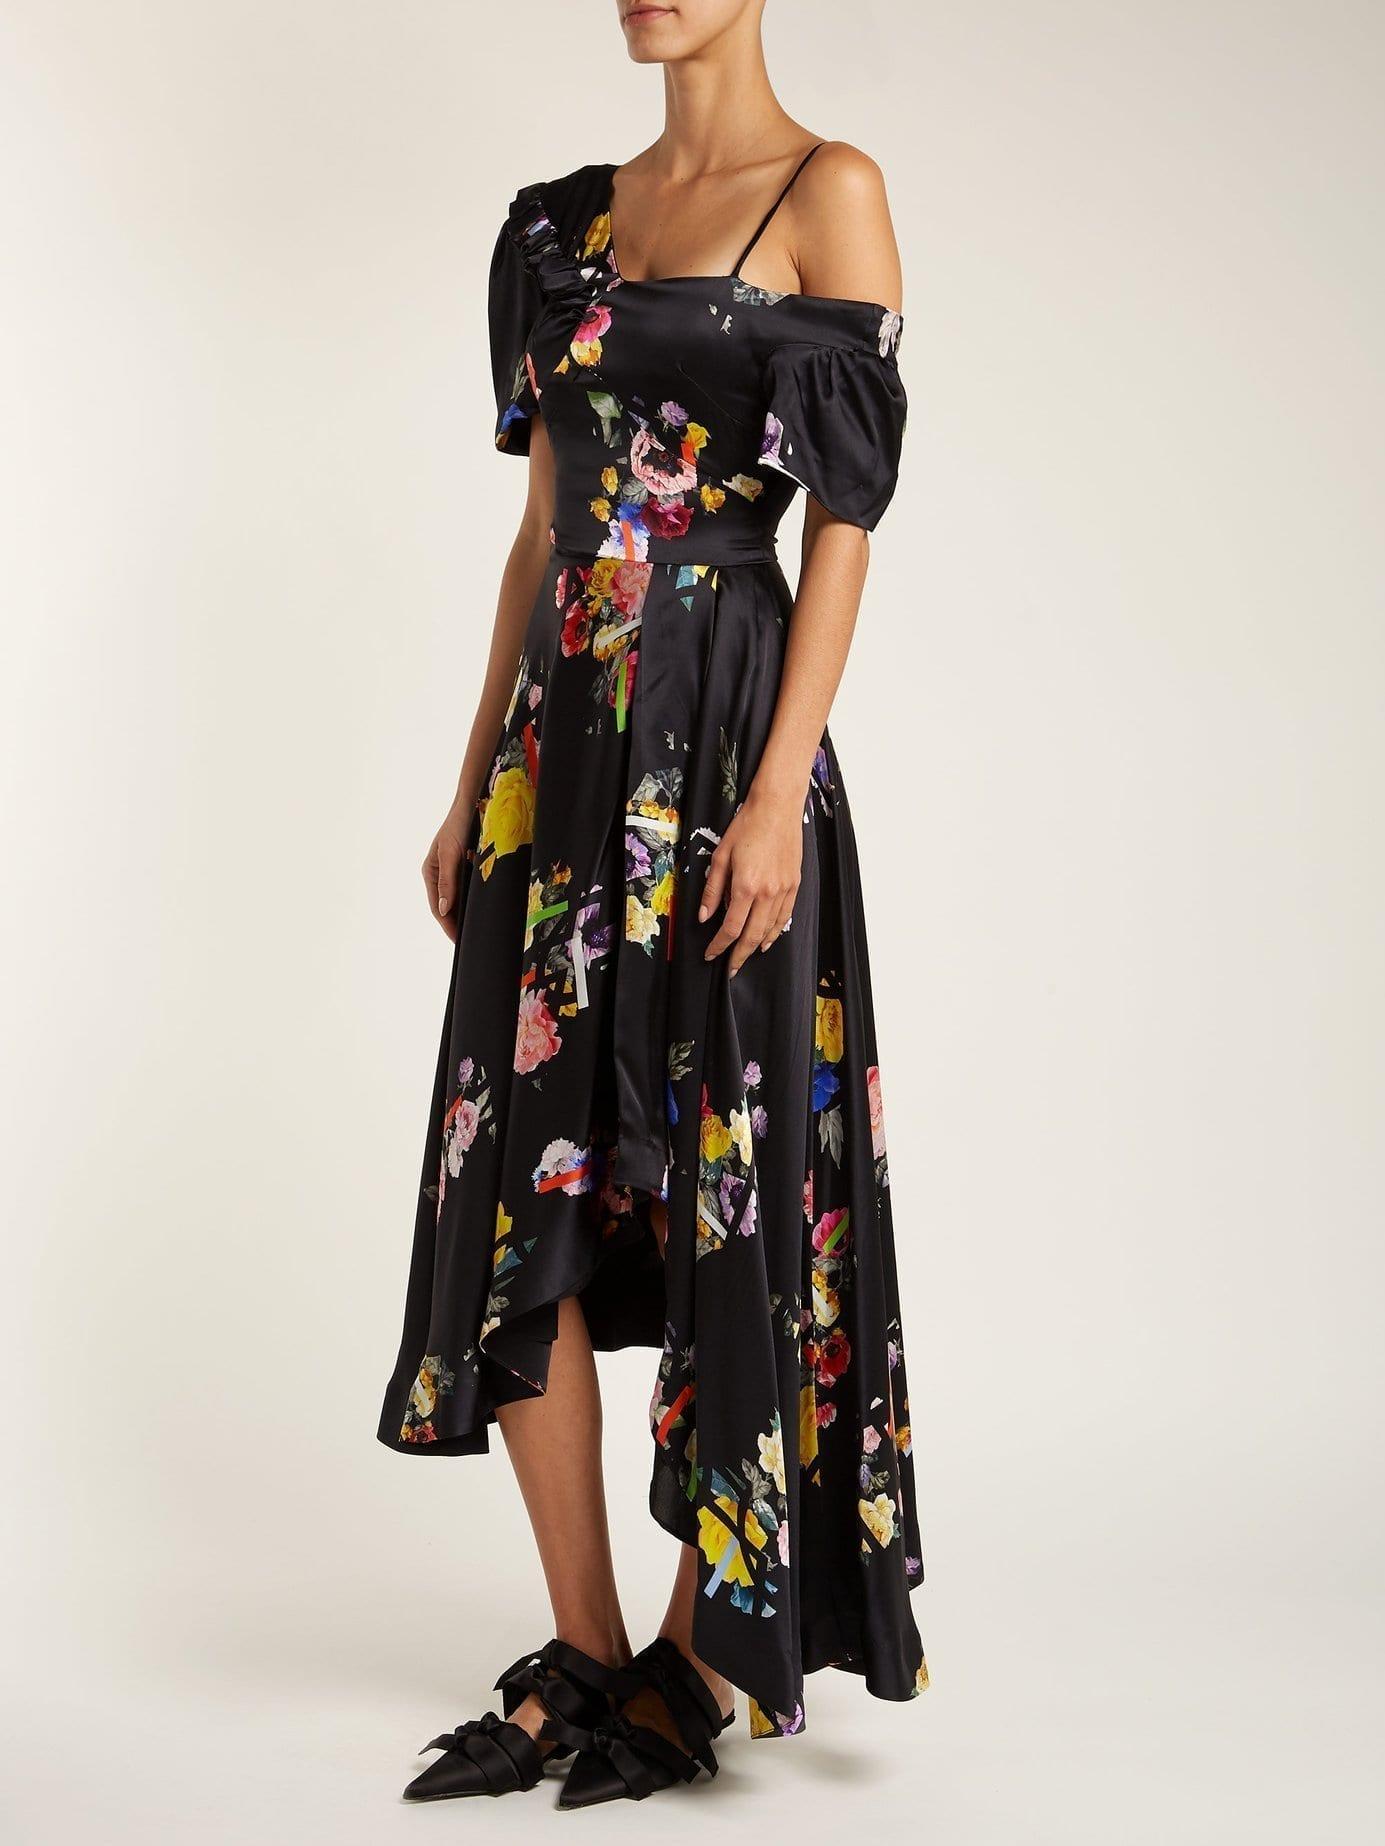 PREEN BY THORNTON BREGAZZI Irene Off The Shoulder Silk Black / Floral Printed Dress